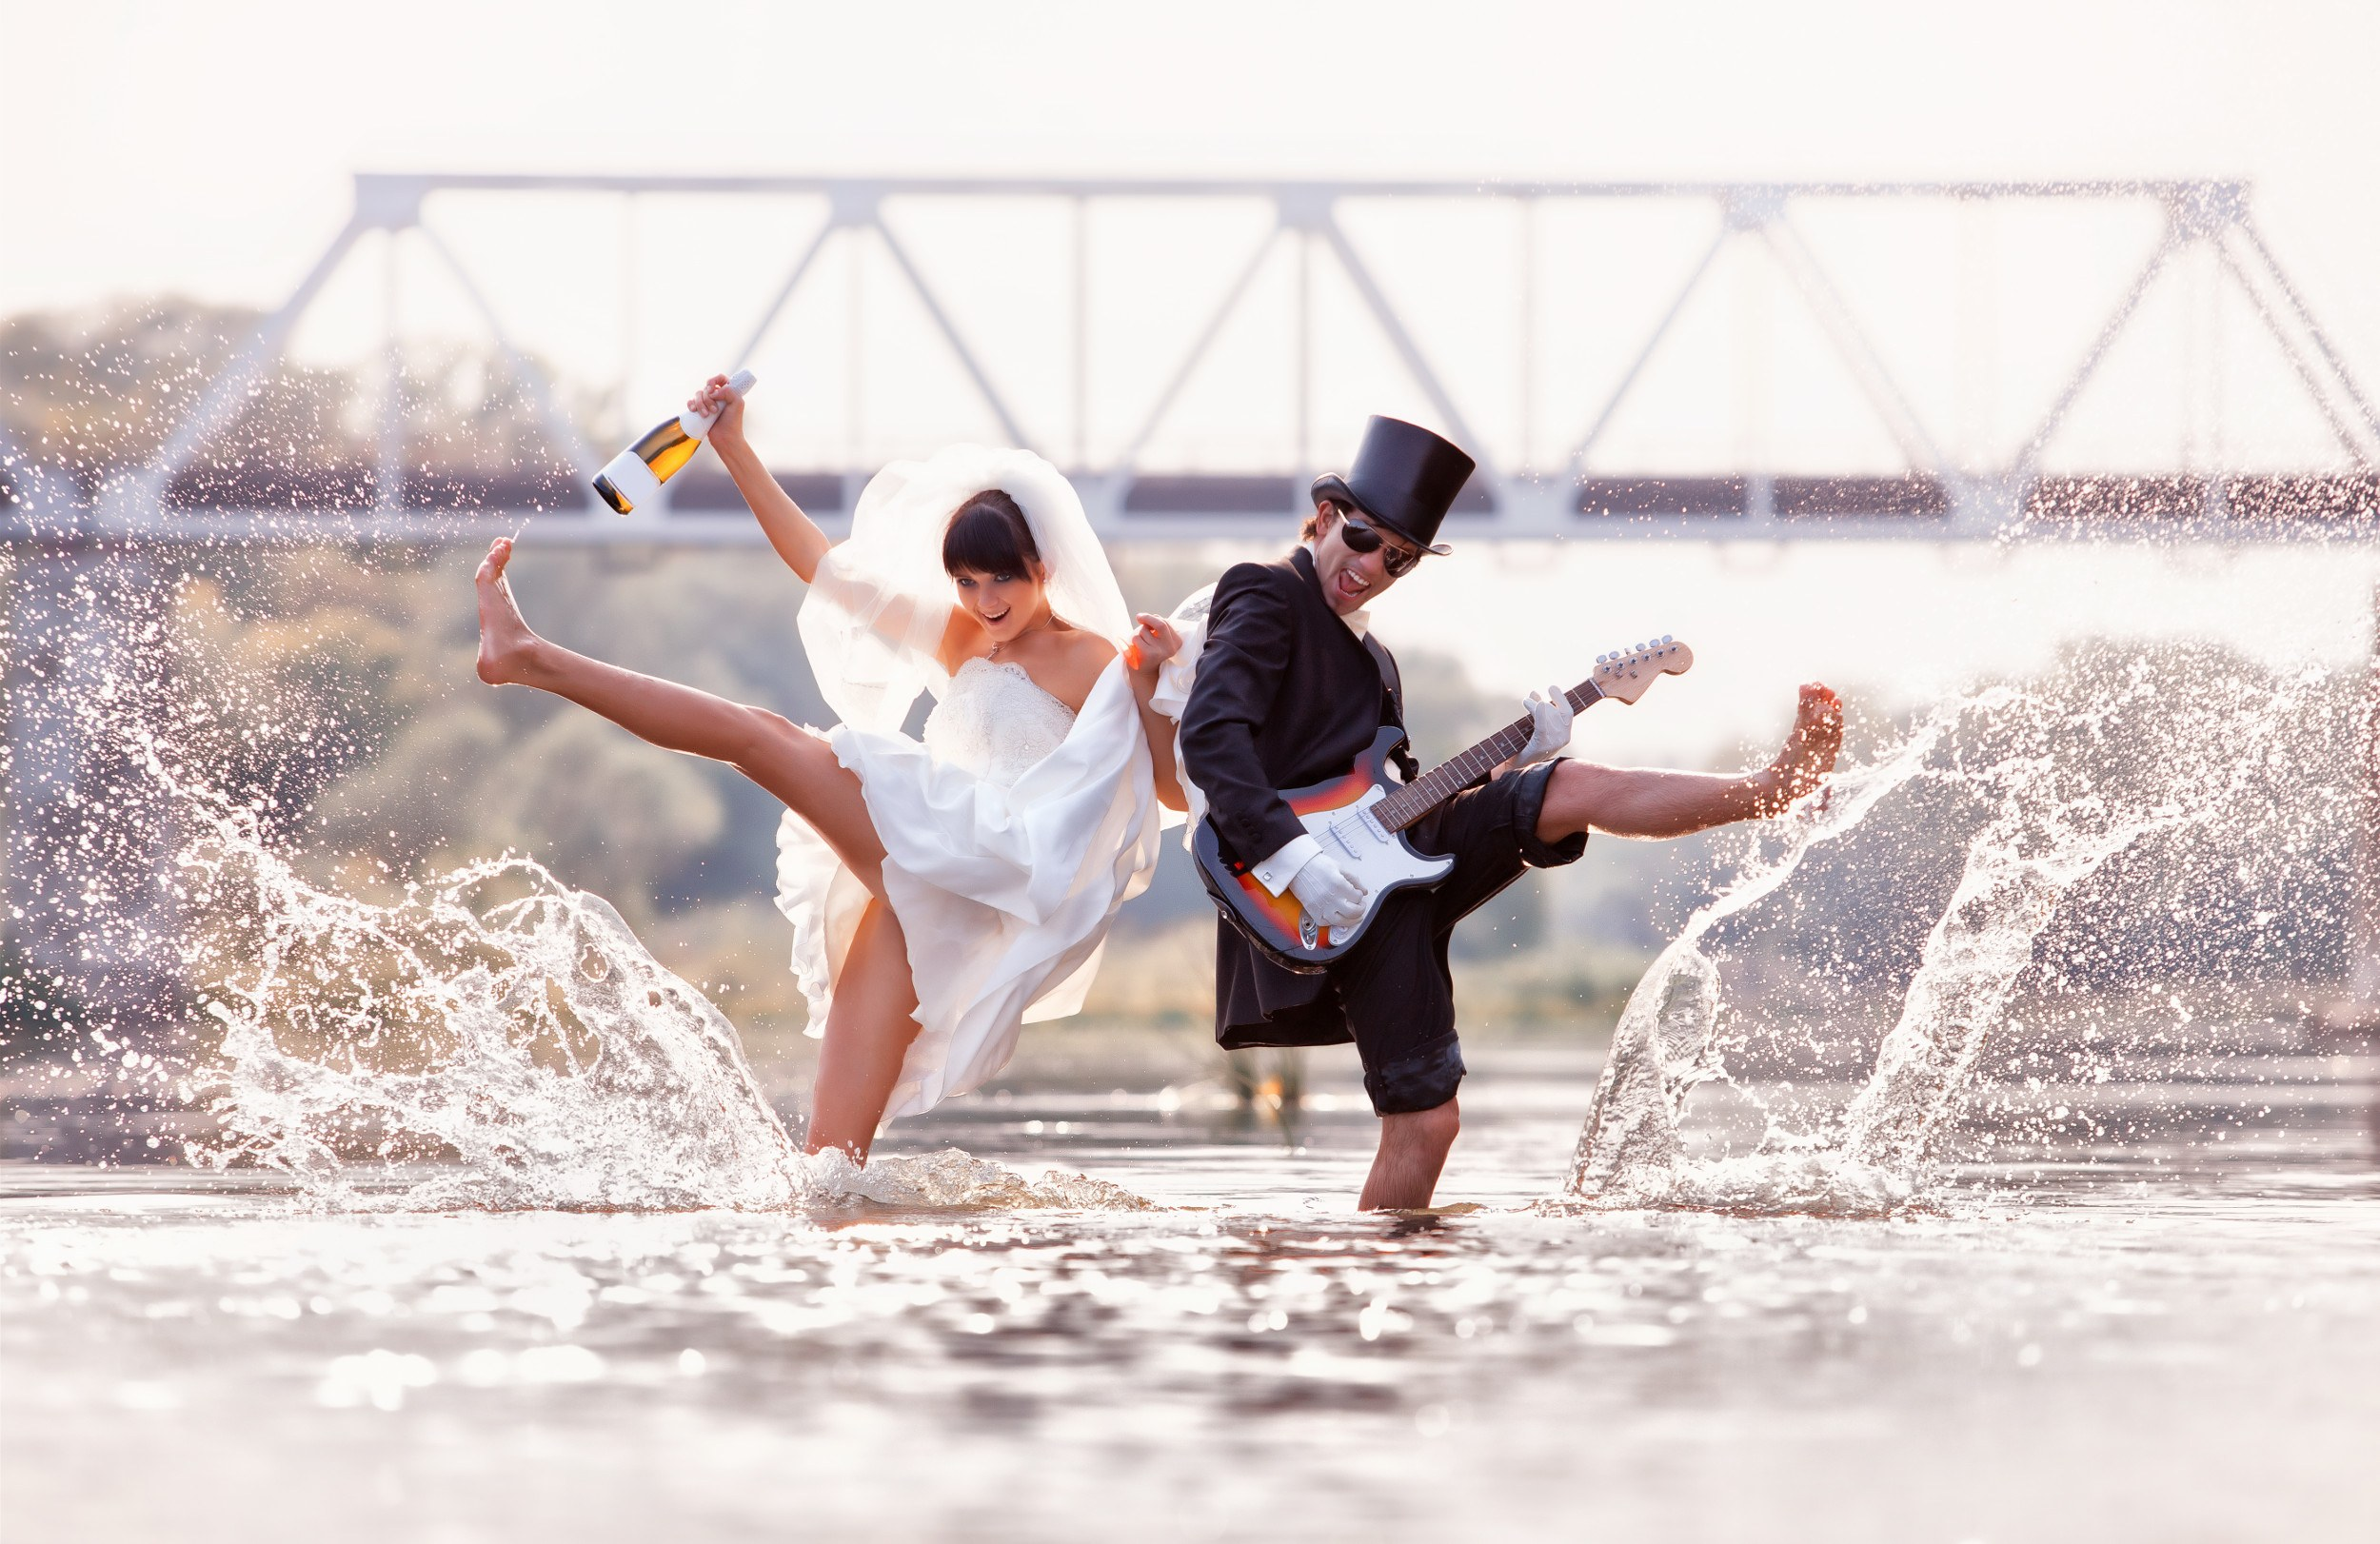 InterContinental-Geneva-Hotel-Meetings-Events-Weddings